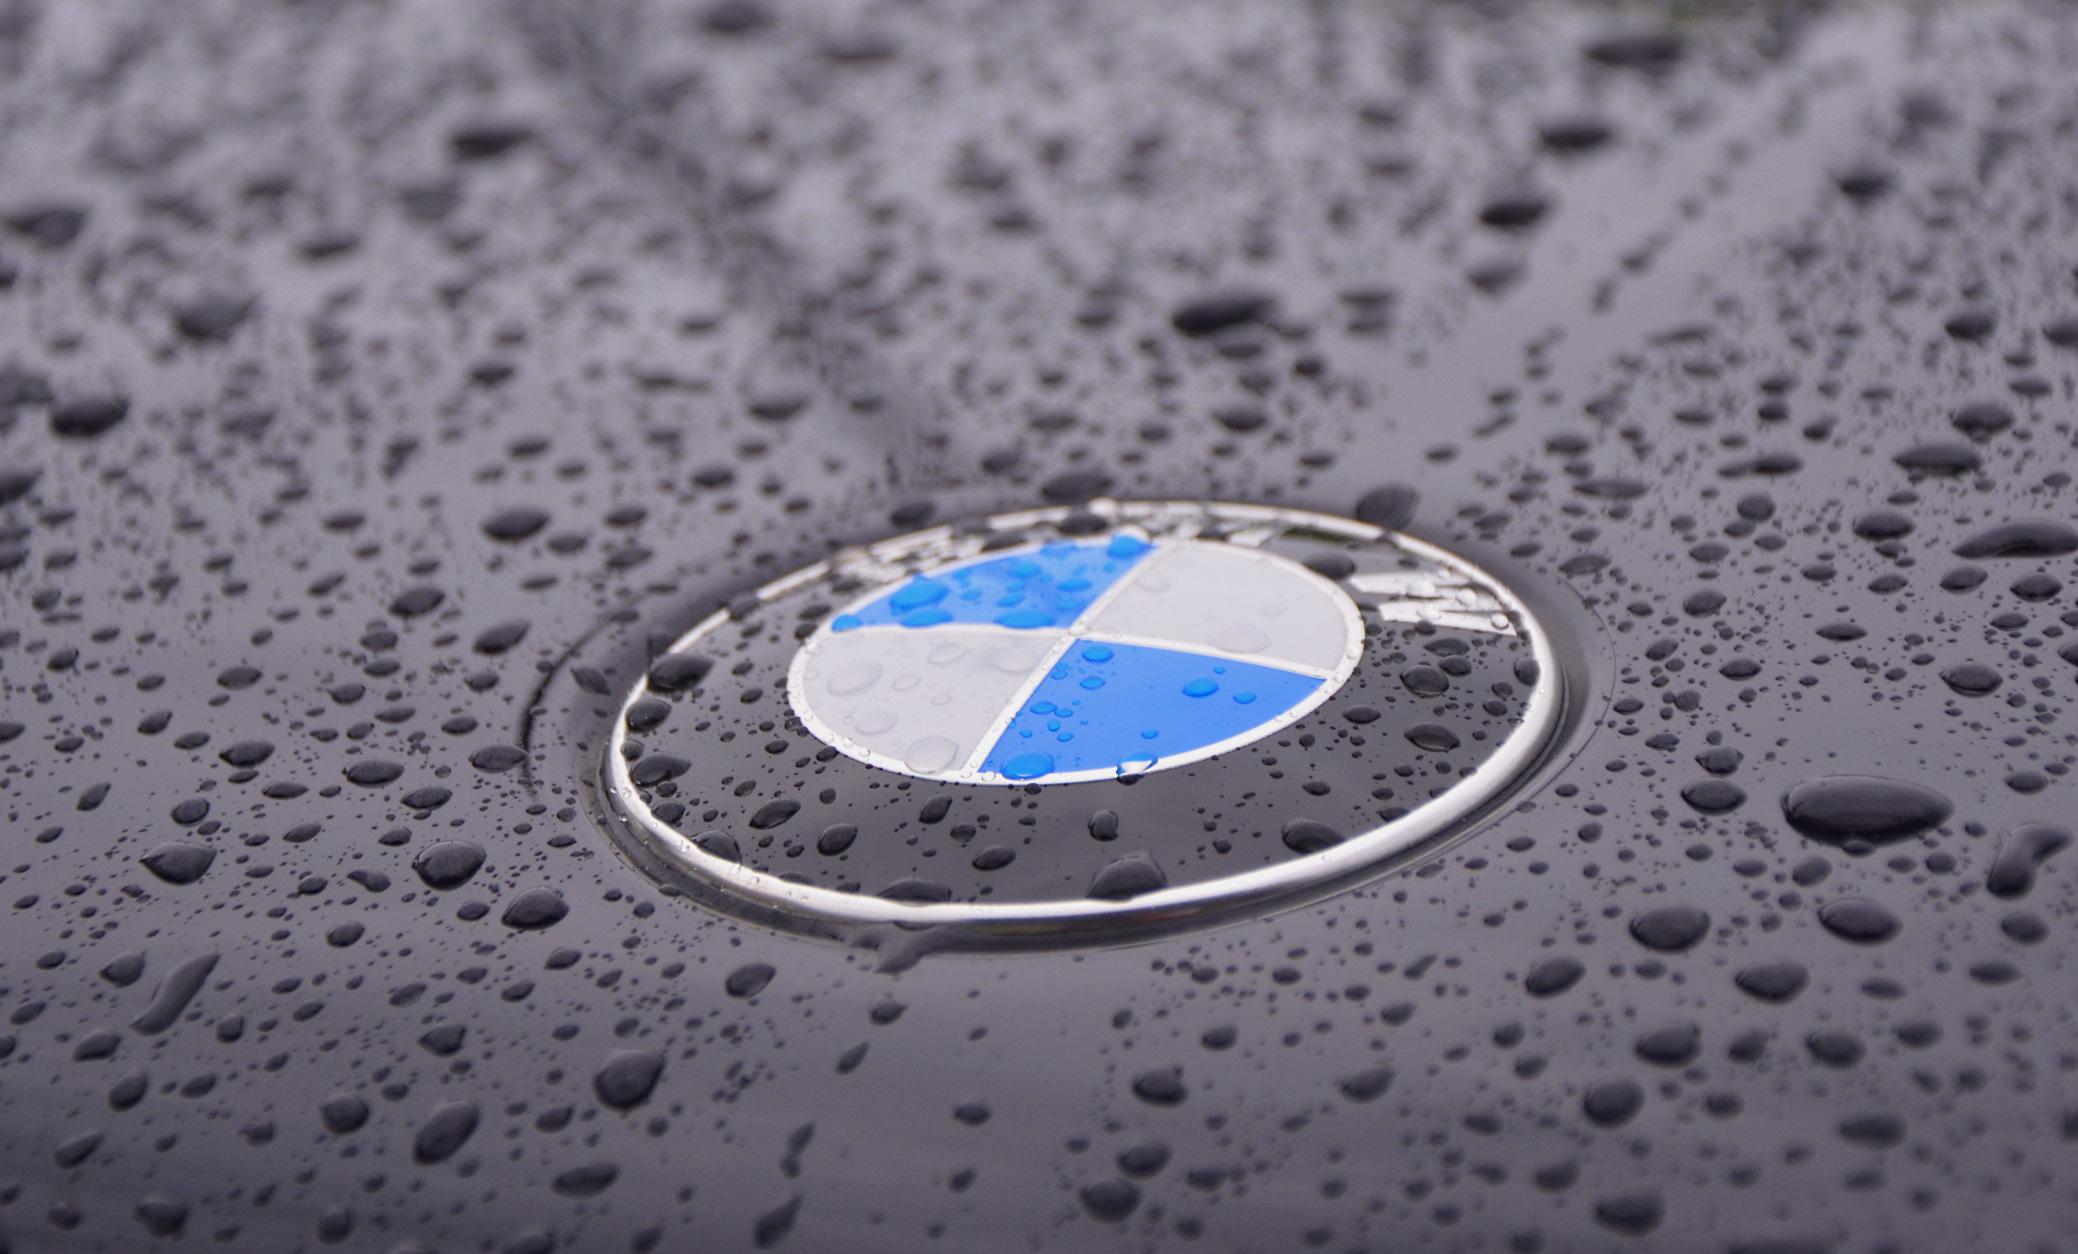 BMWLogoMotorhaubemittel.jpg